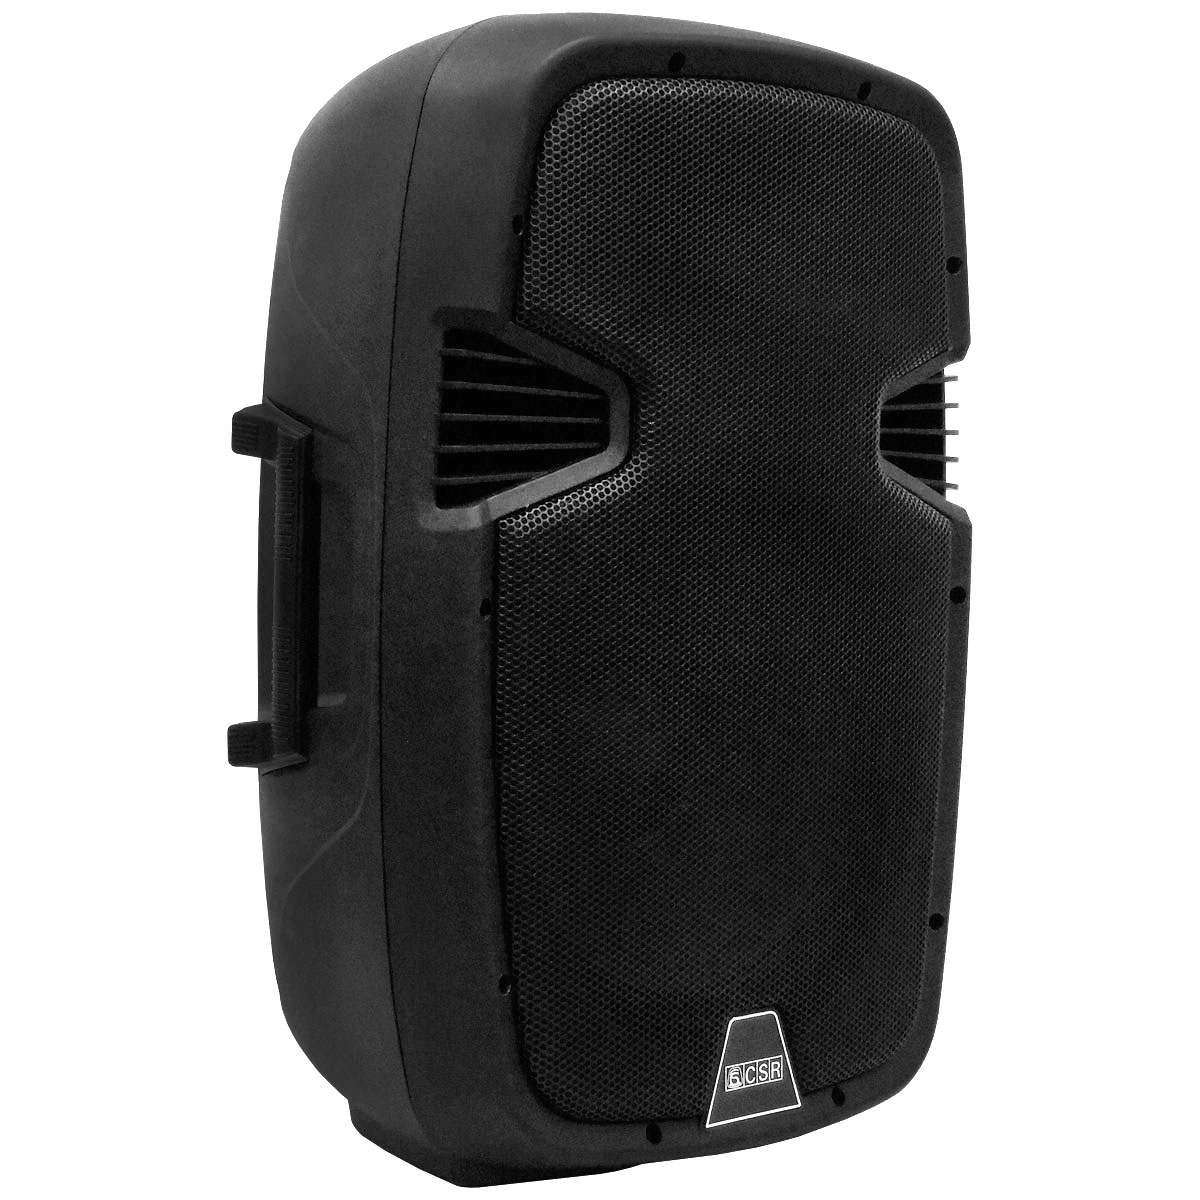 5515USB - Caixa Ativa 300W c/ Bluetooth e USB CSR 5515 USB - CSR